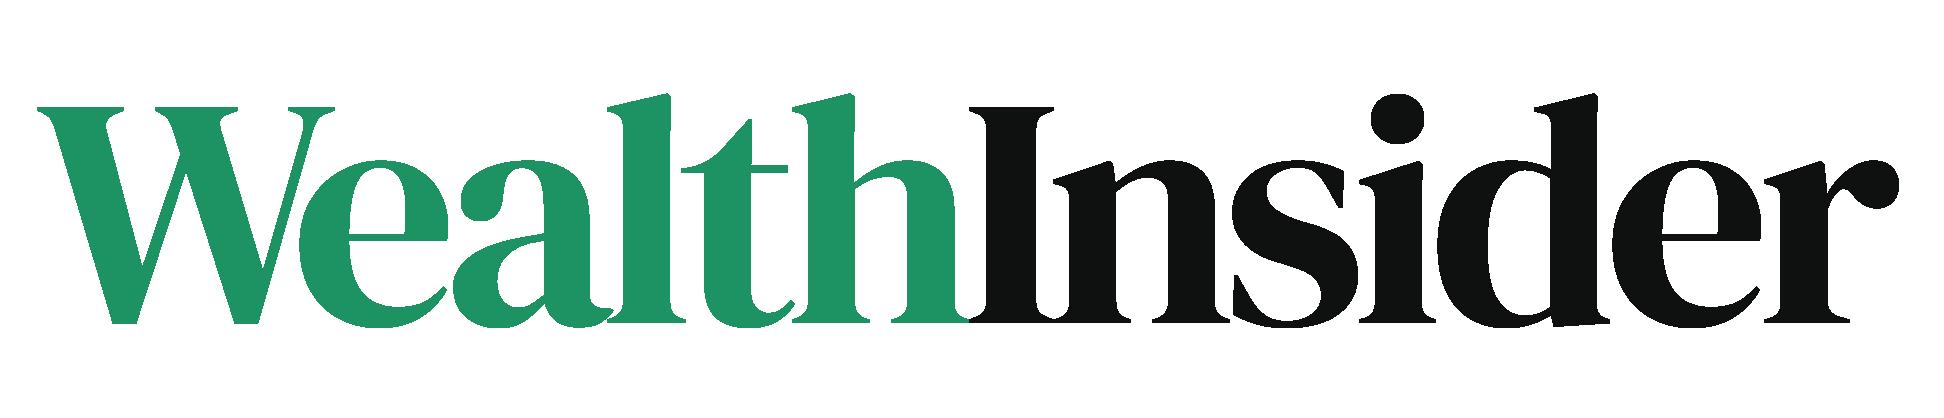 wealth-insider-logo-transparent-01-green-02-07